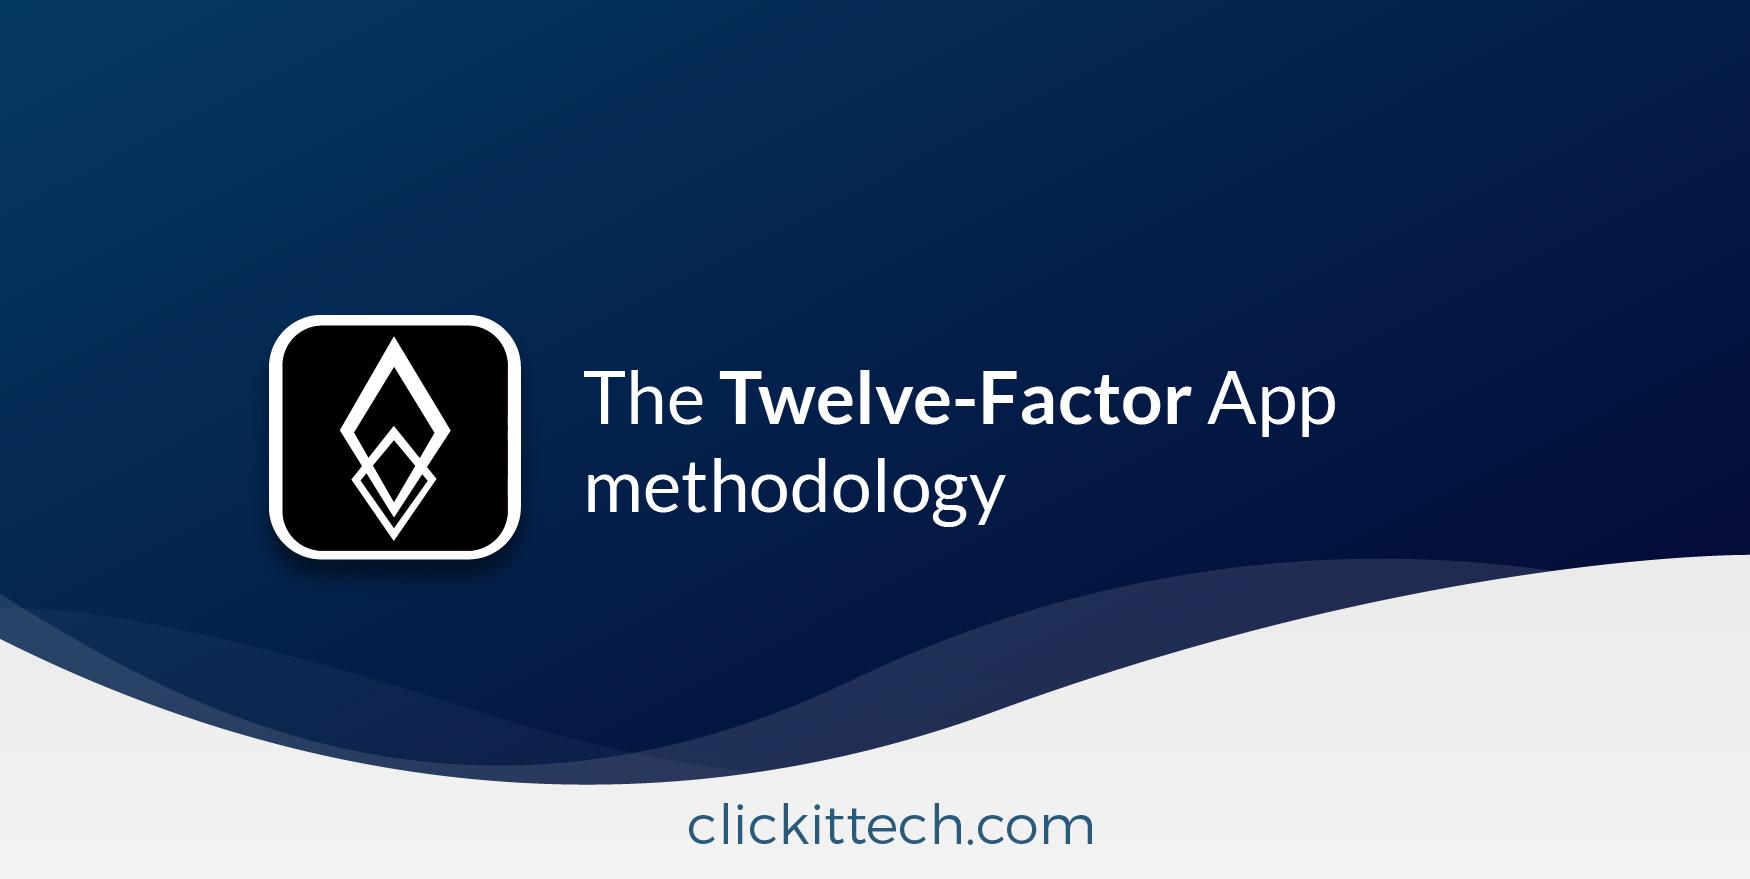 How to use the Twelve-Factor App methodology for SaaS Laravel app on AWS